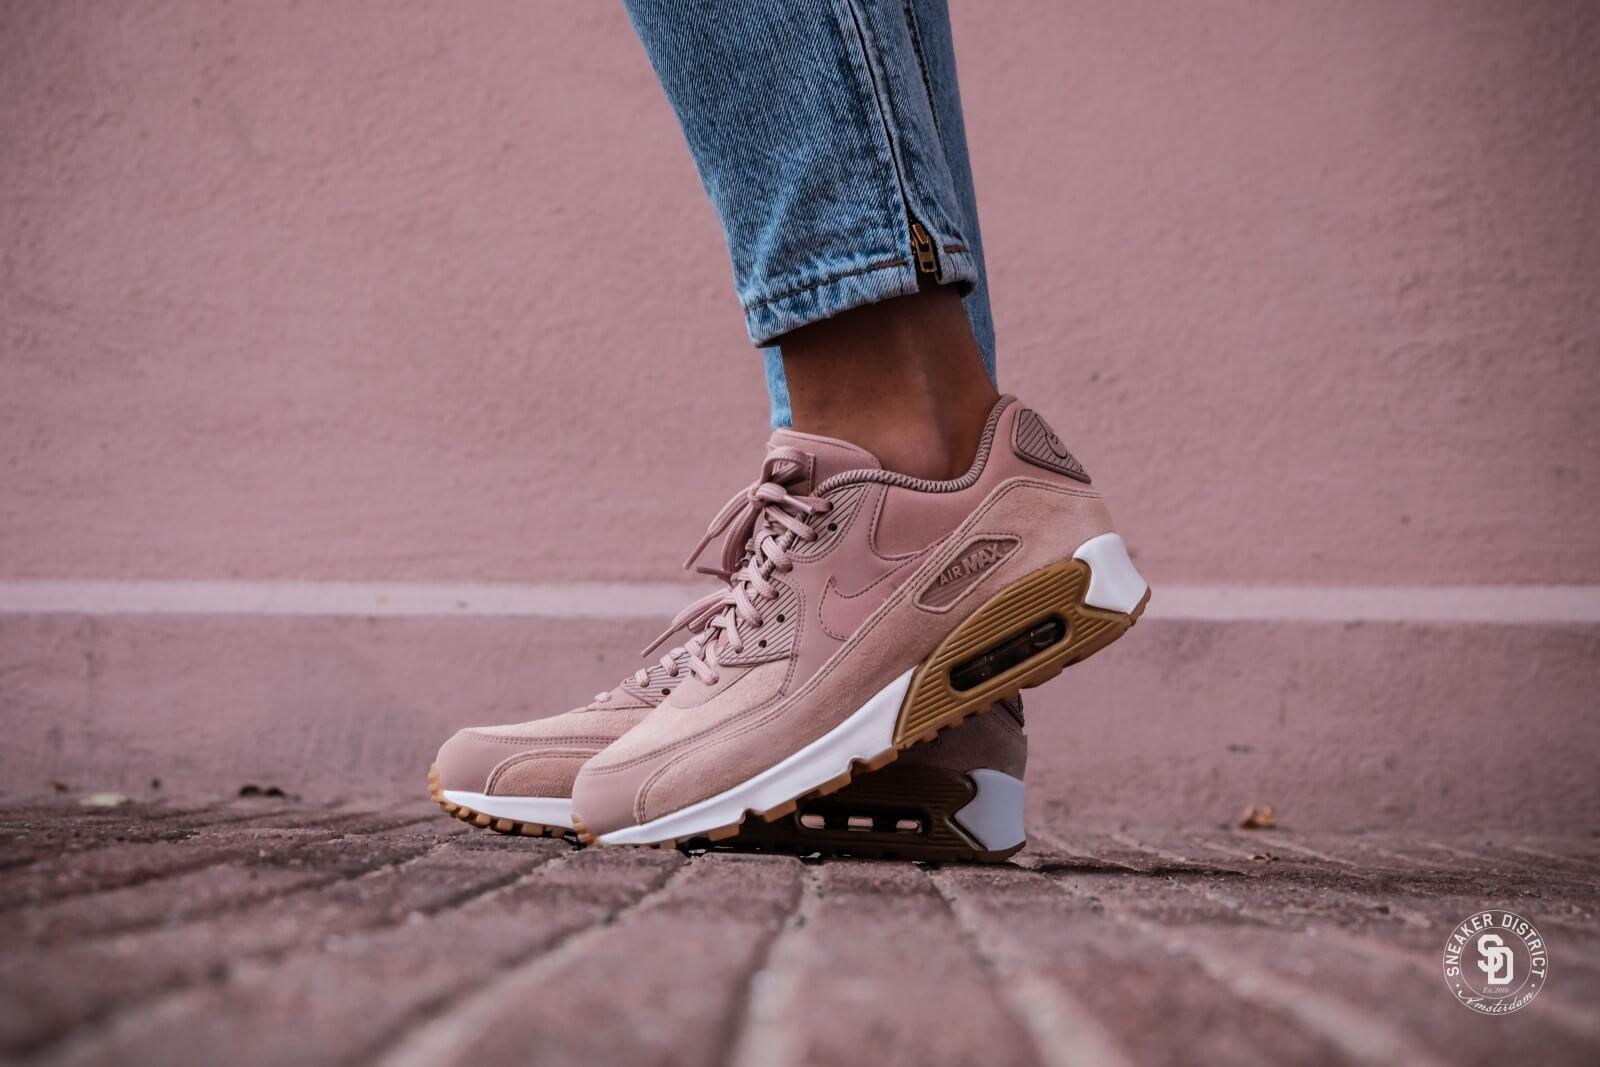 Nike Air Force 1 Low Particle Pink Brings Pastels to Fall   Nice Kicks